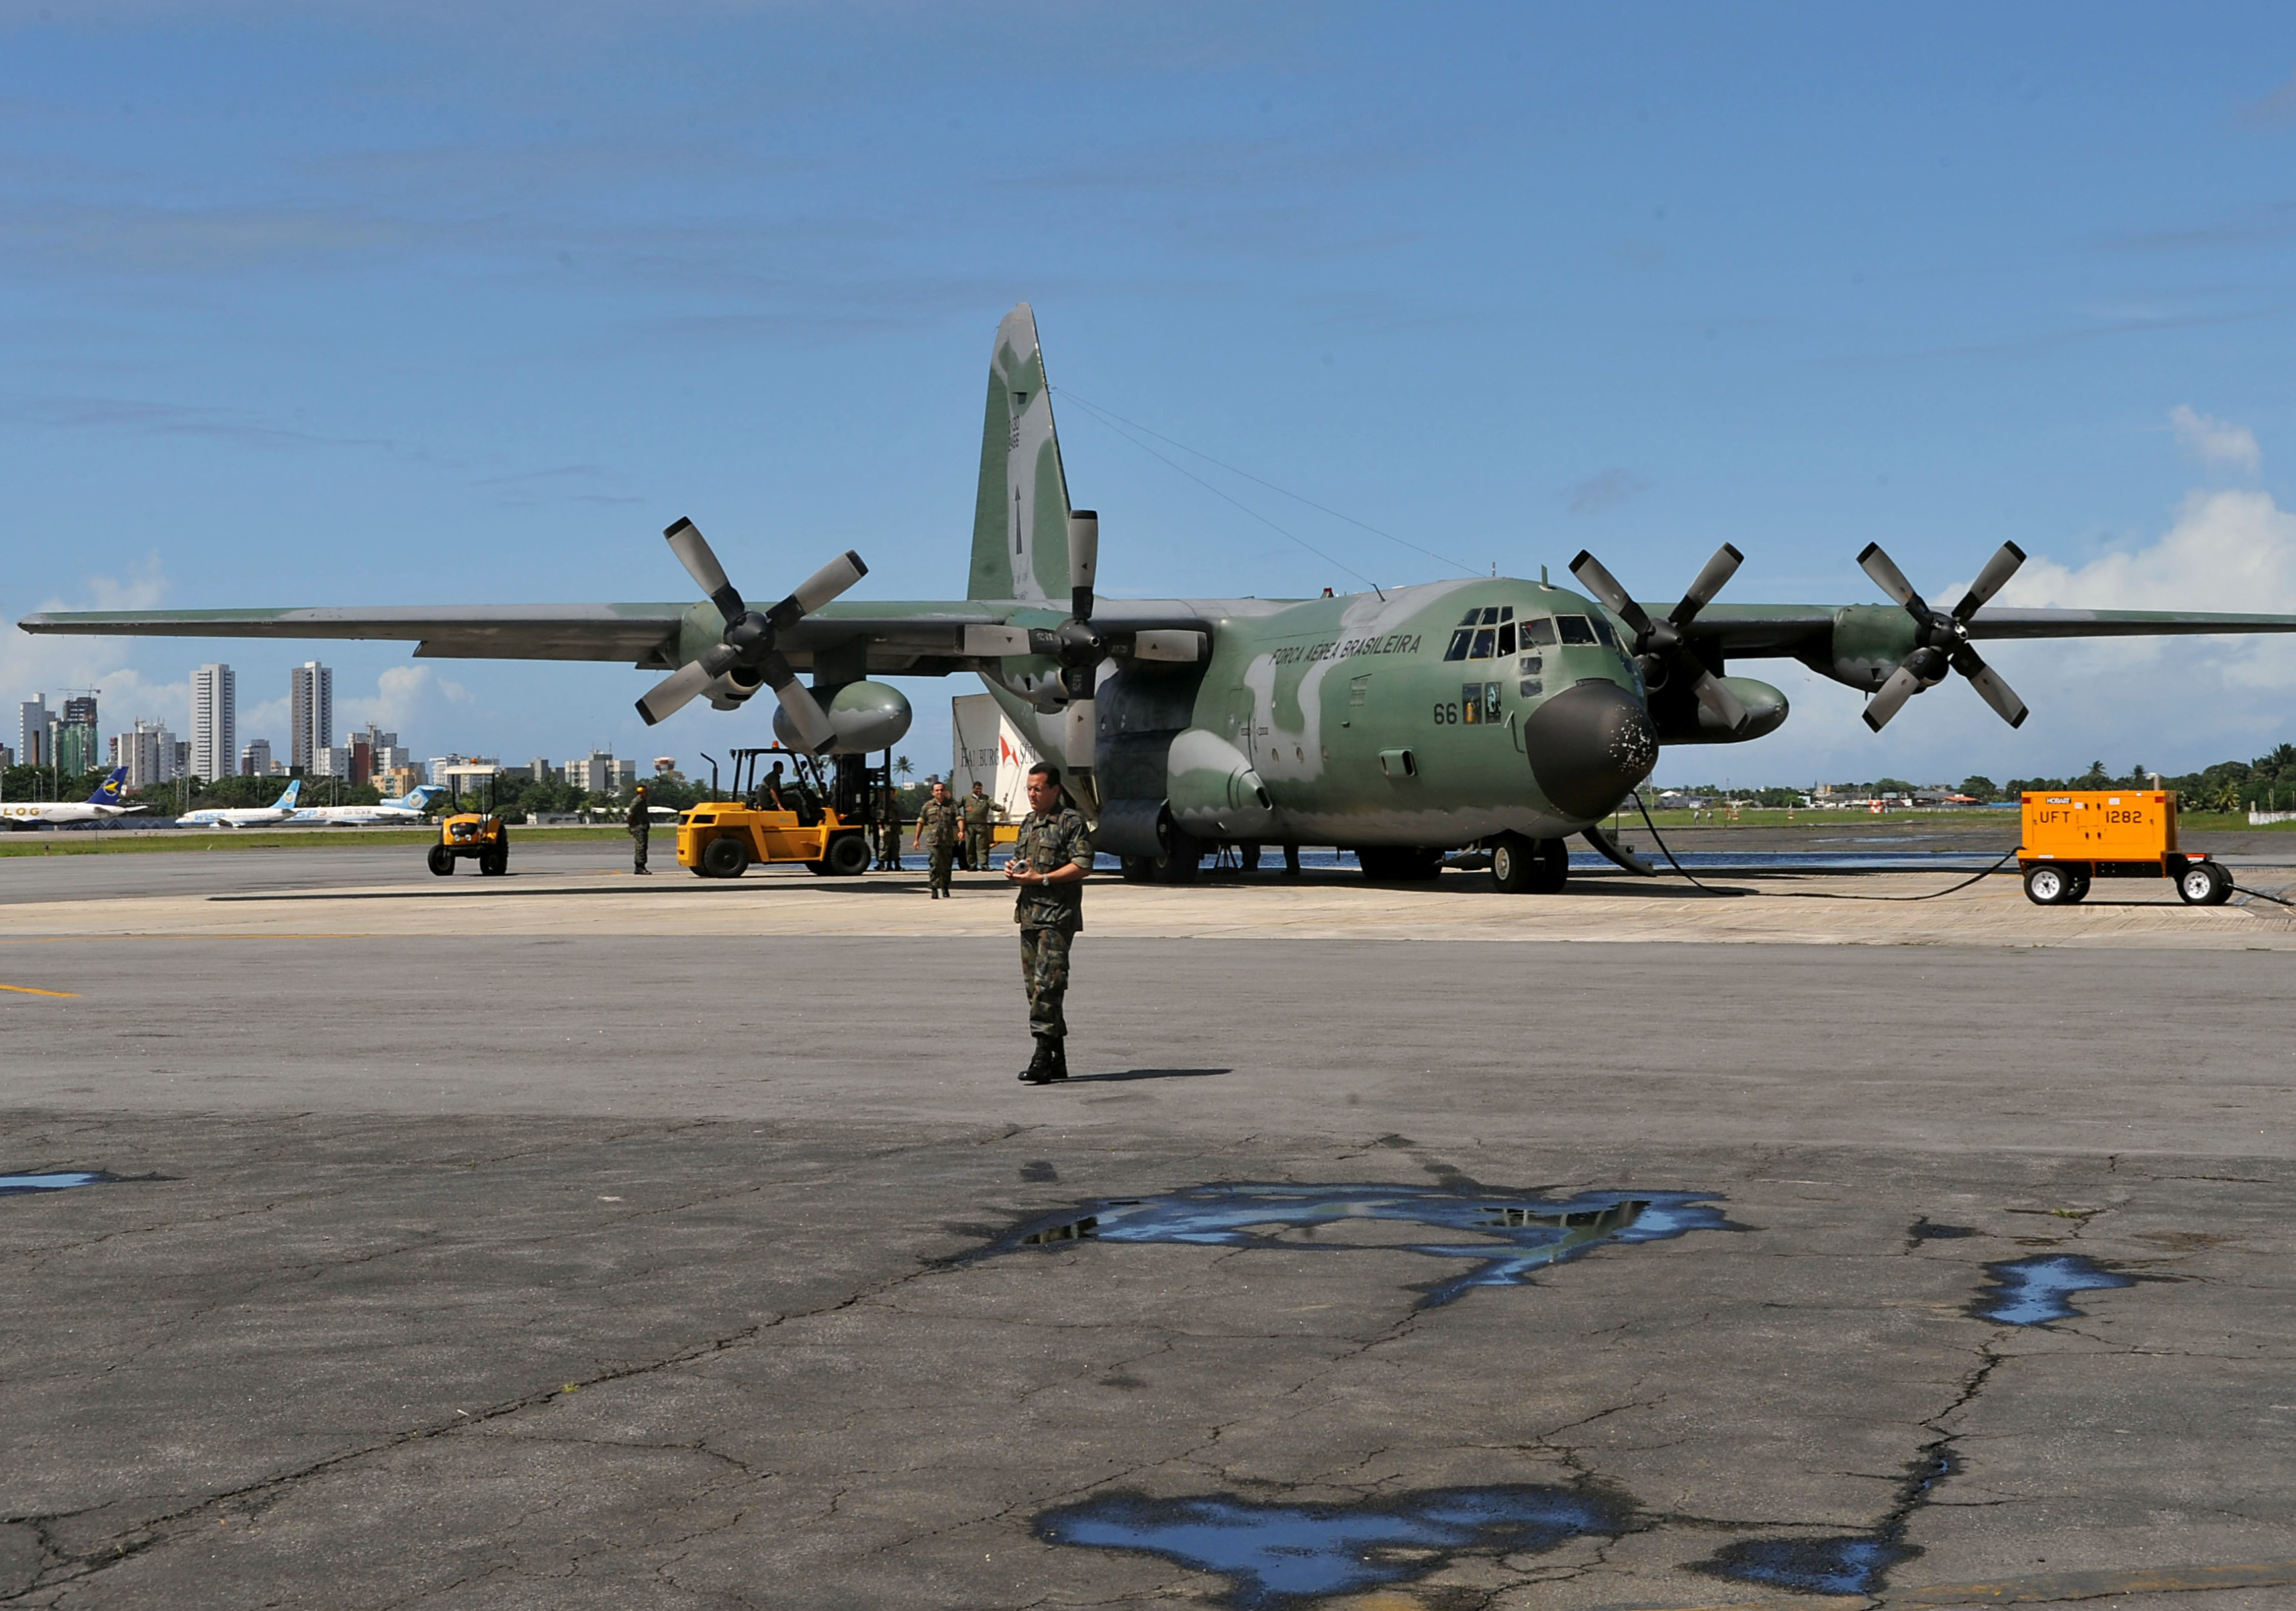 Elicottero C130 : File c hercules brazilian air force i g wikimedia